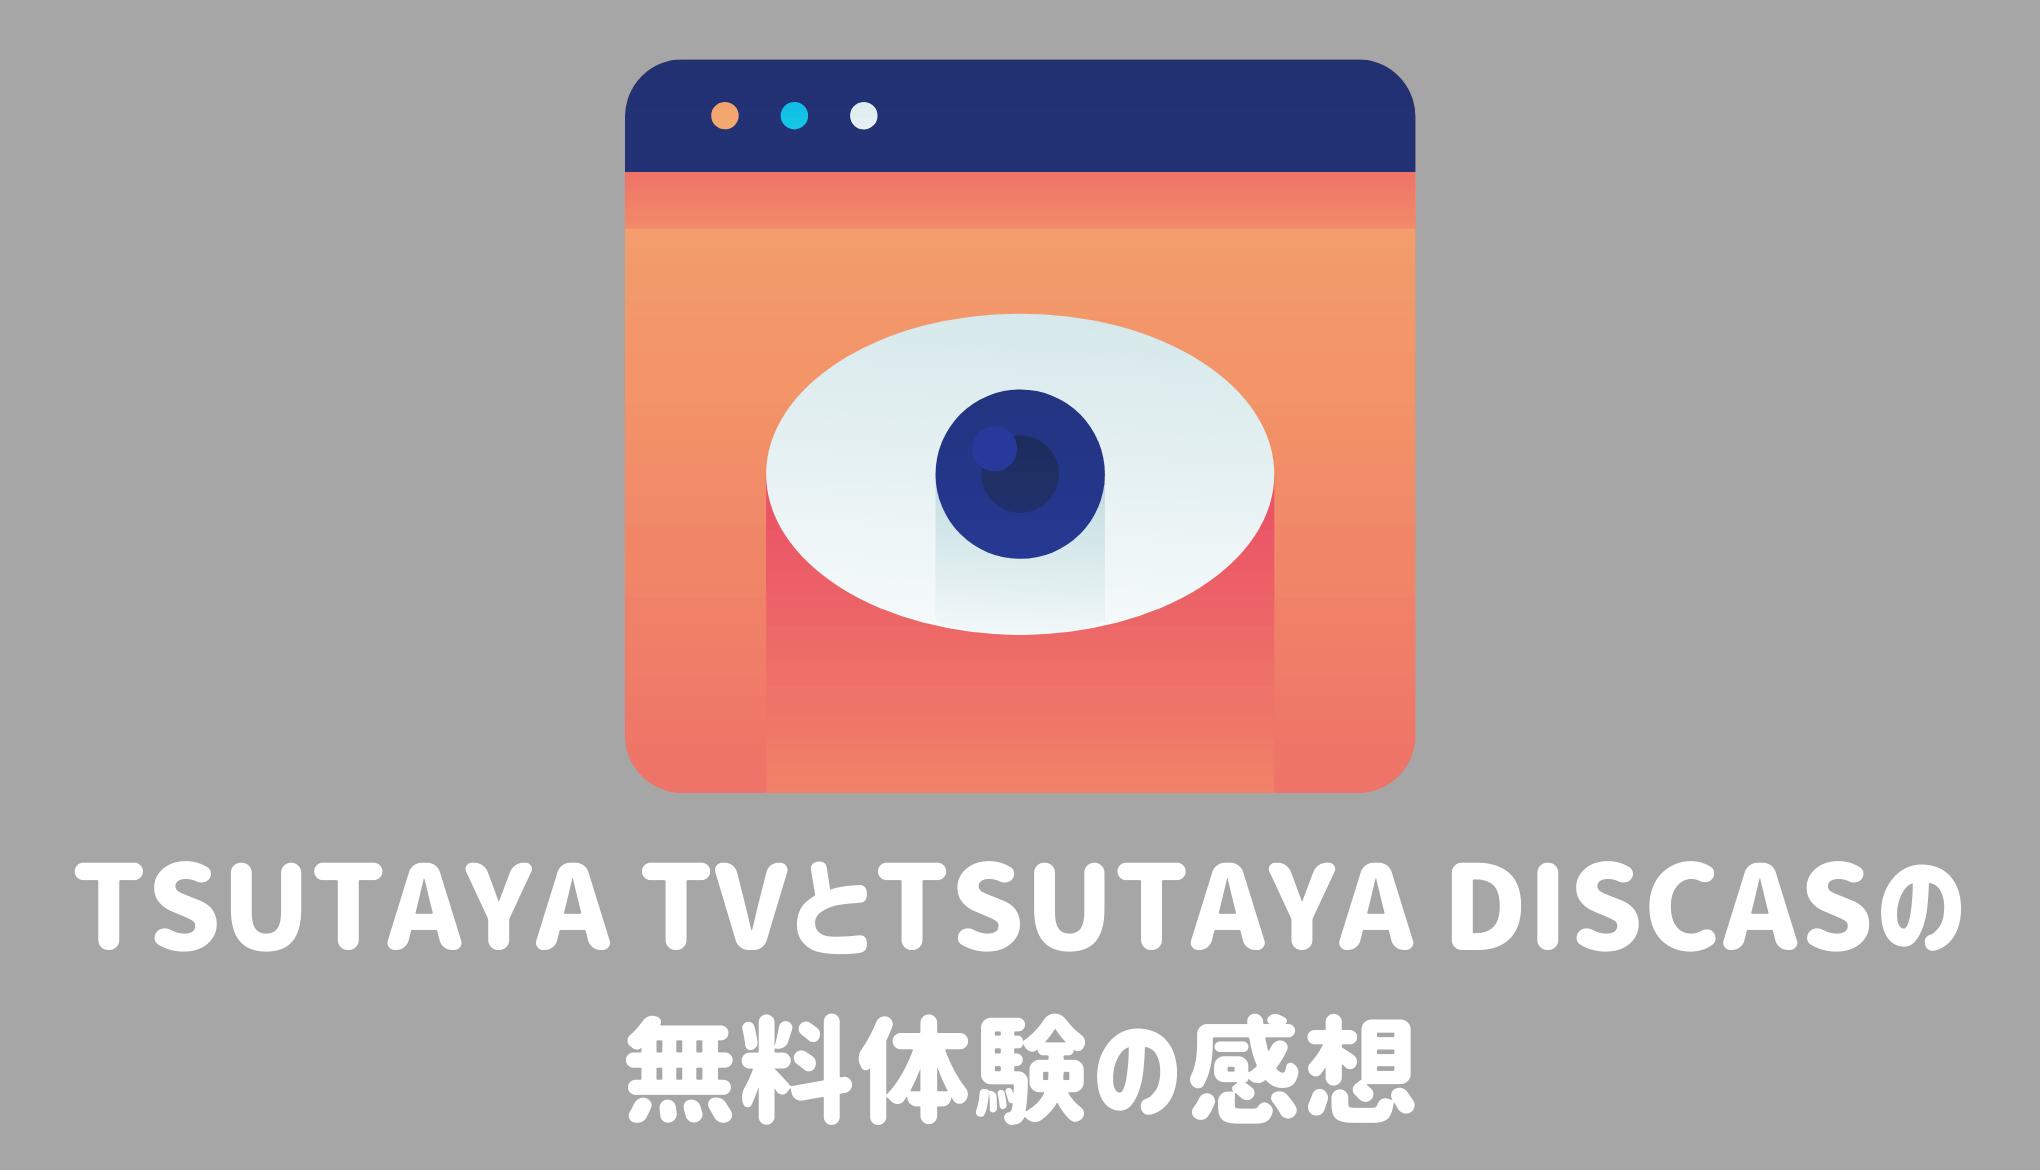 TSUTAYA TVとTSUTAYA DISCASの無料体験の感想